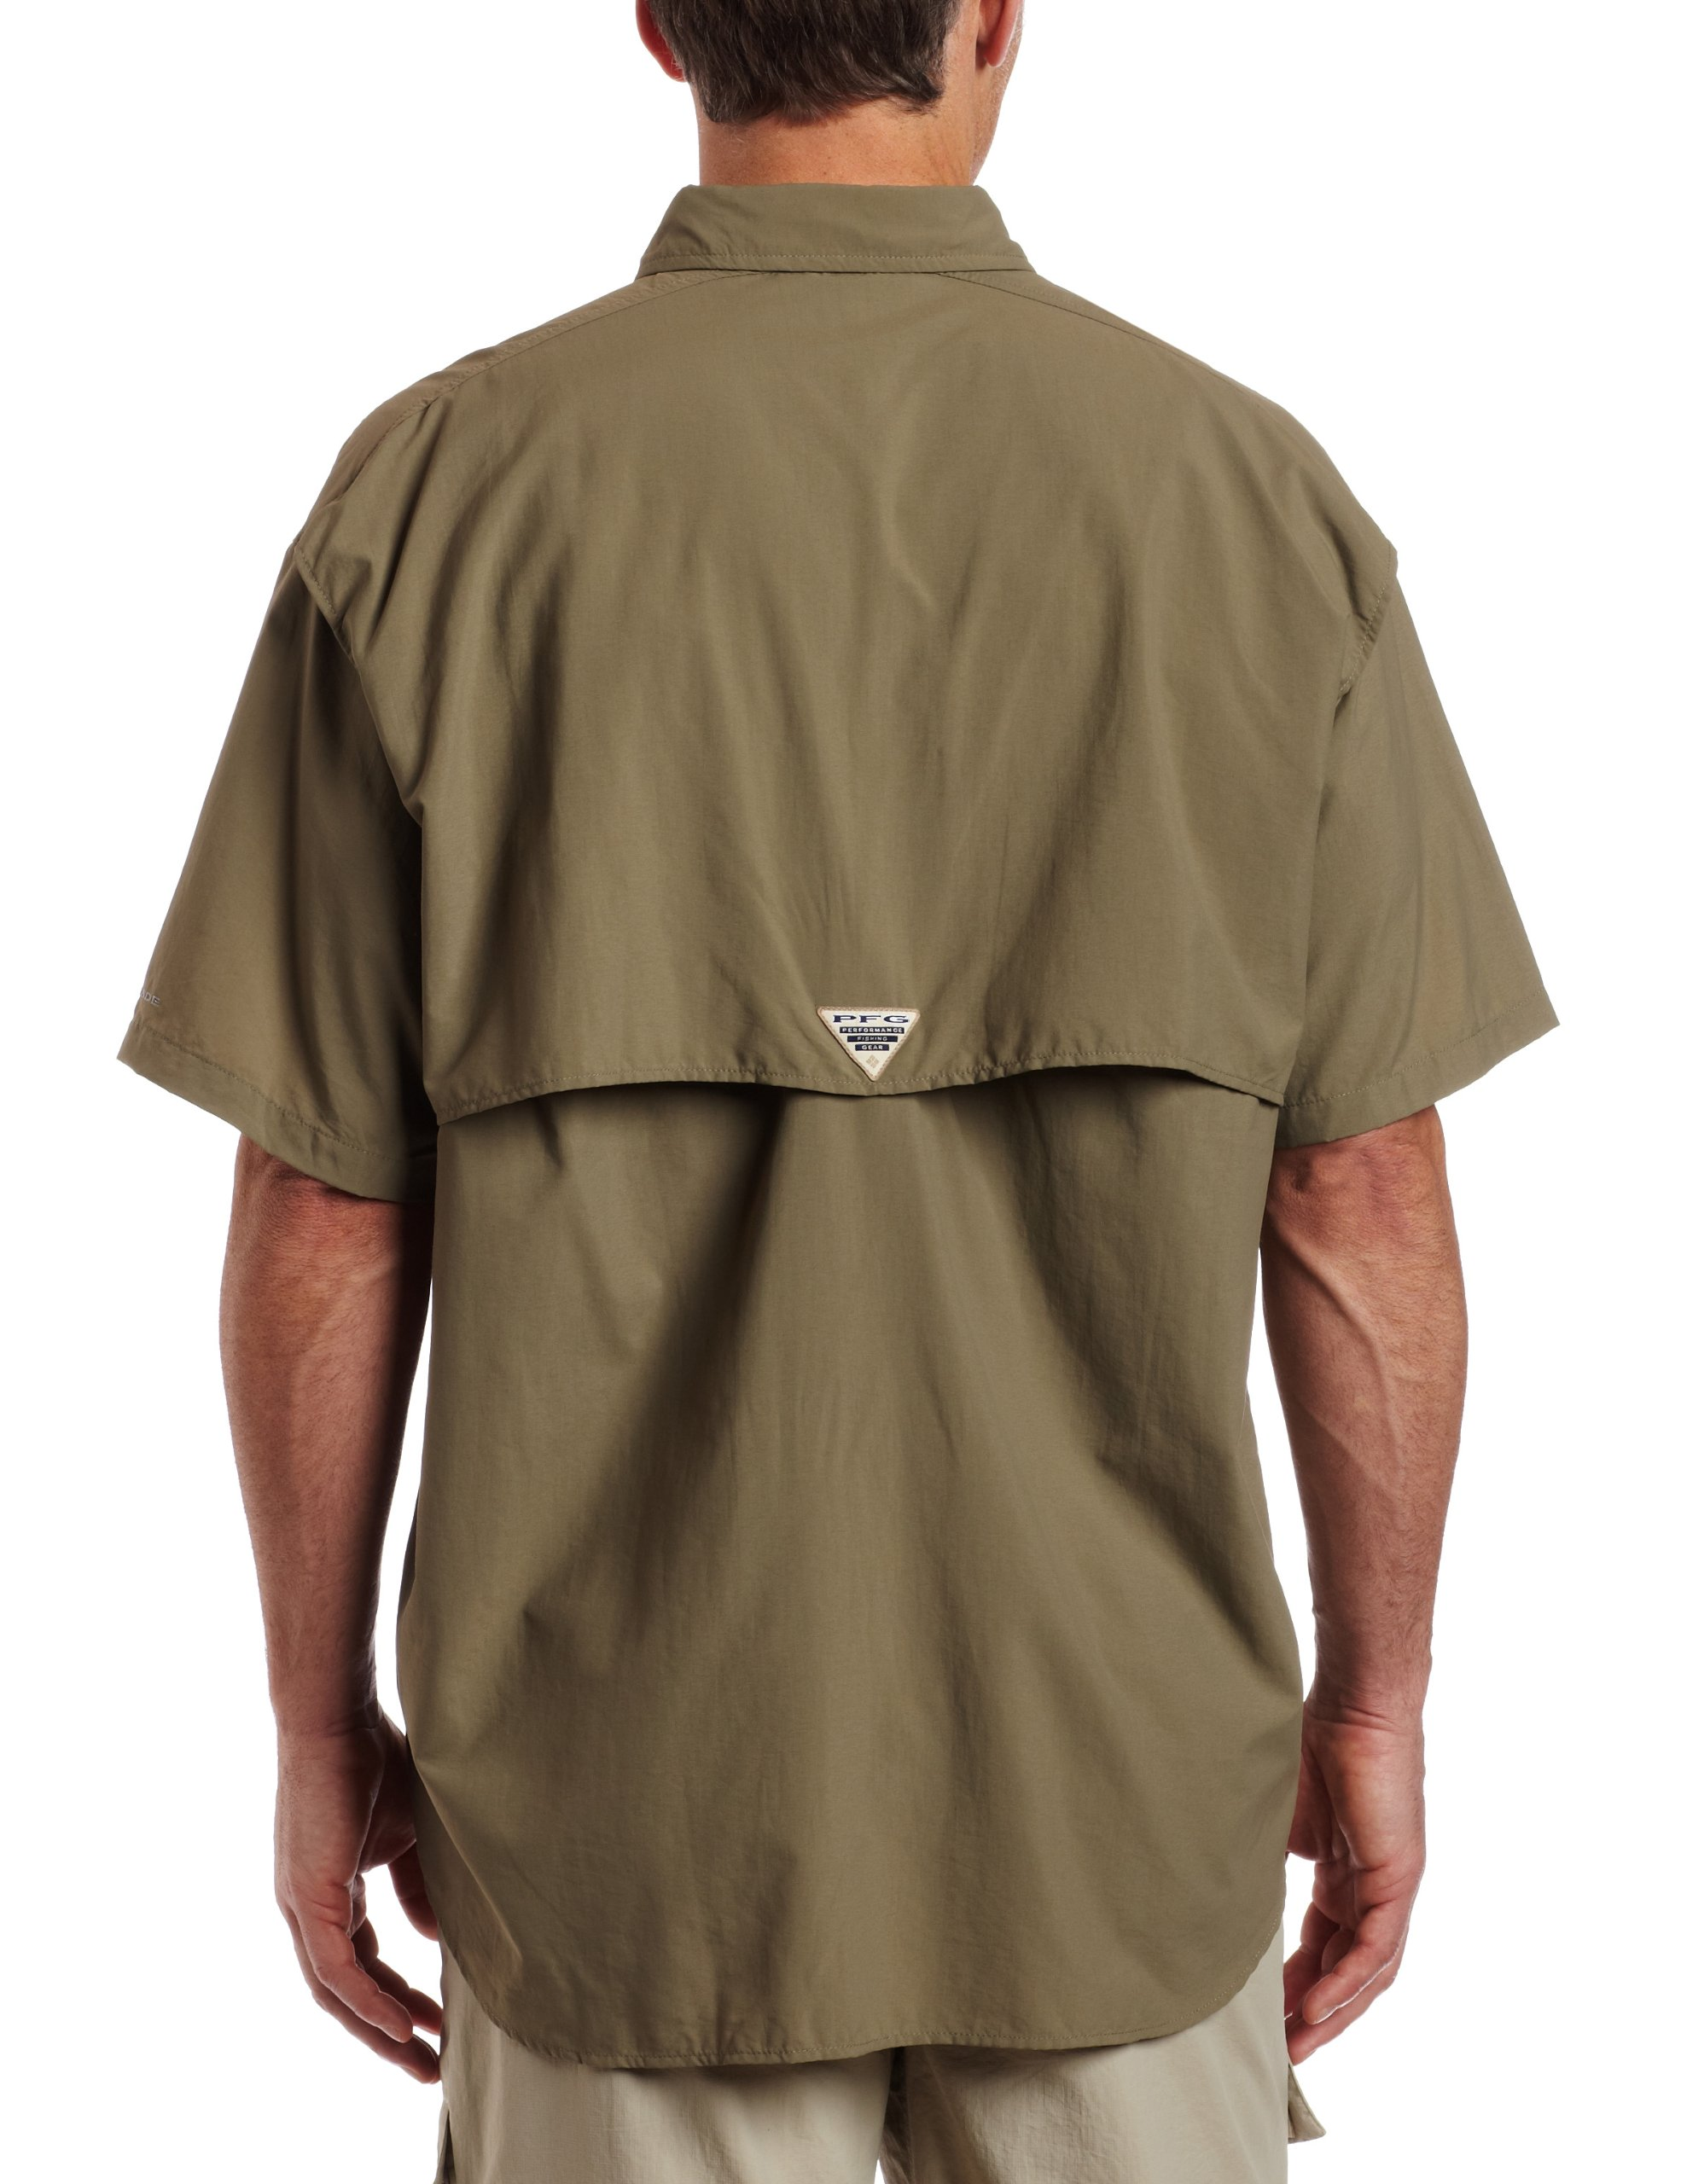 Columbia-Men-039-s-PFG-Bahama-II-Short-Sleeve-Shirt-T-Choose-SZ-color thumbnail 17